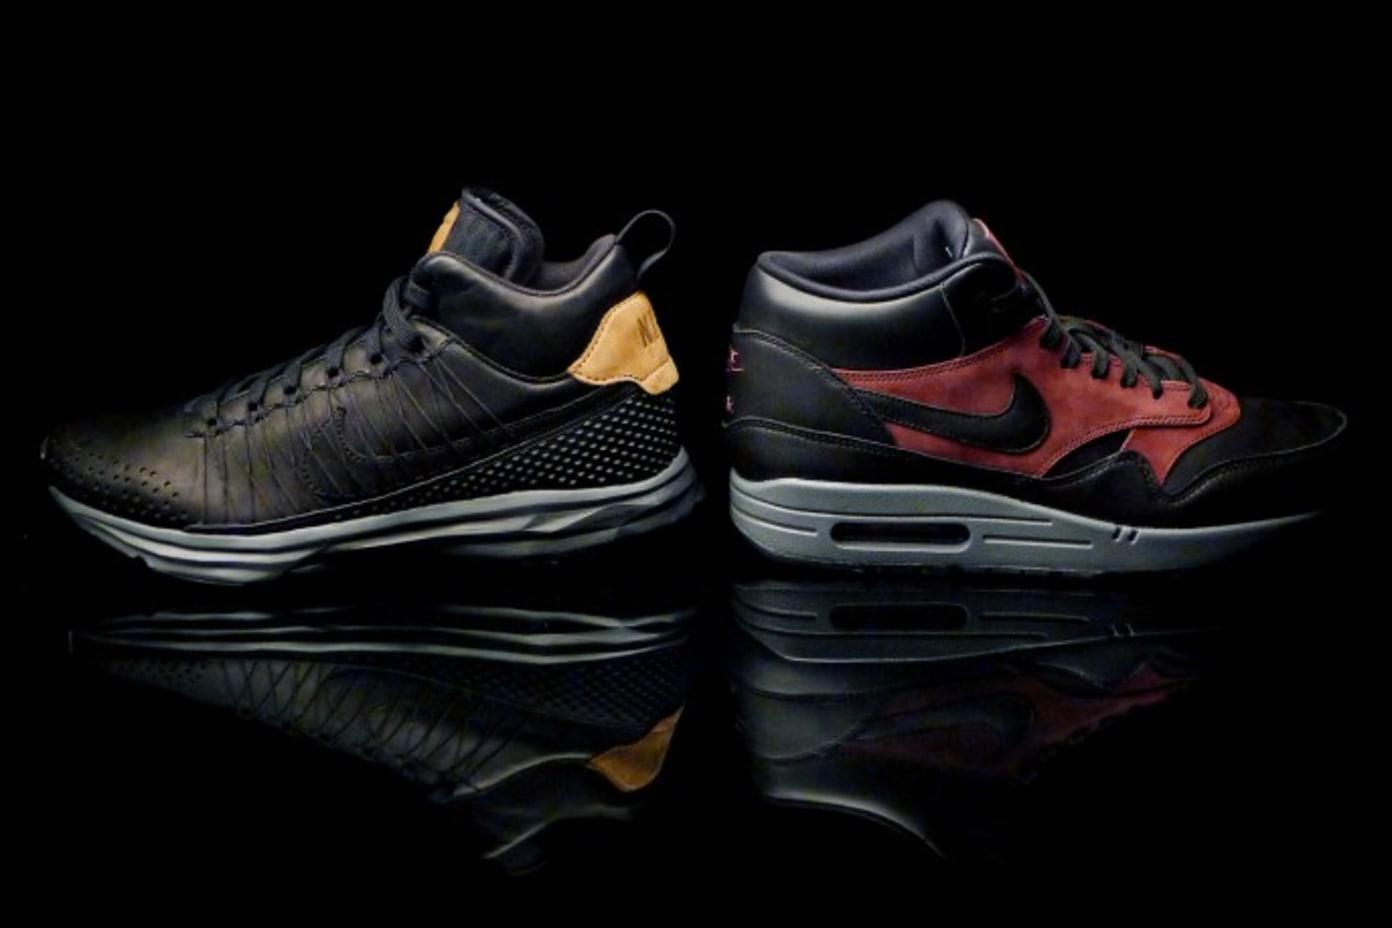 Nike Air Max 1 Mid Deluxe QS & Nike Lunarfresh Sneakerboot QS